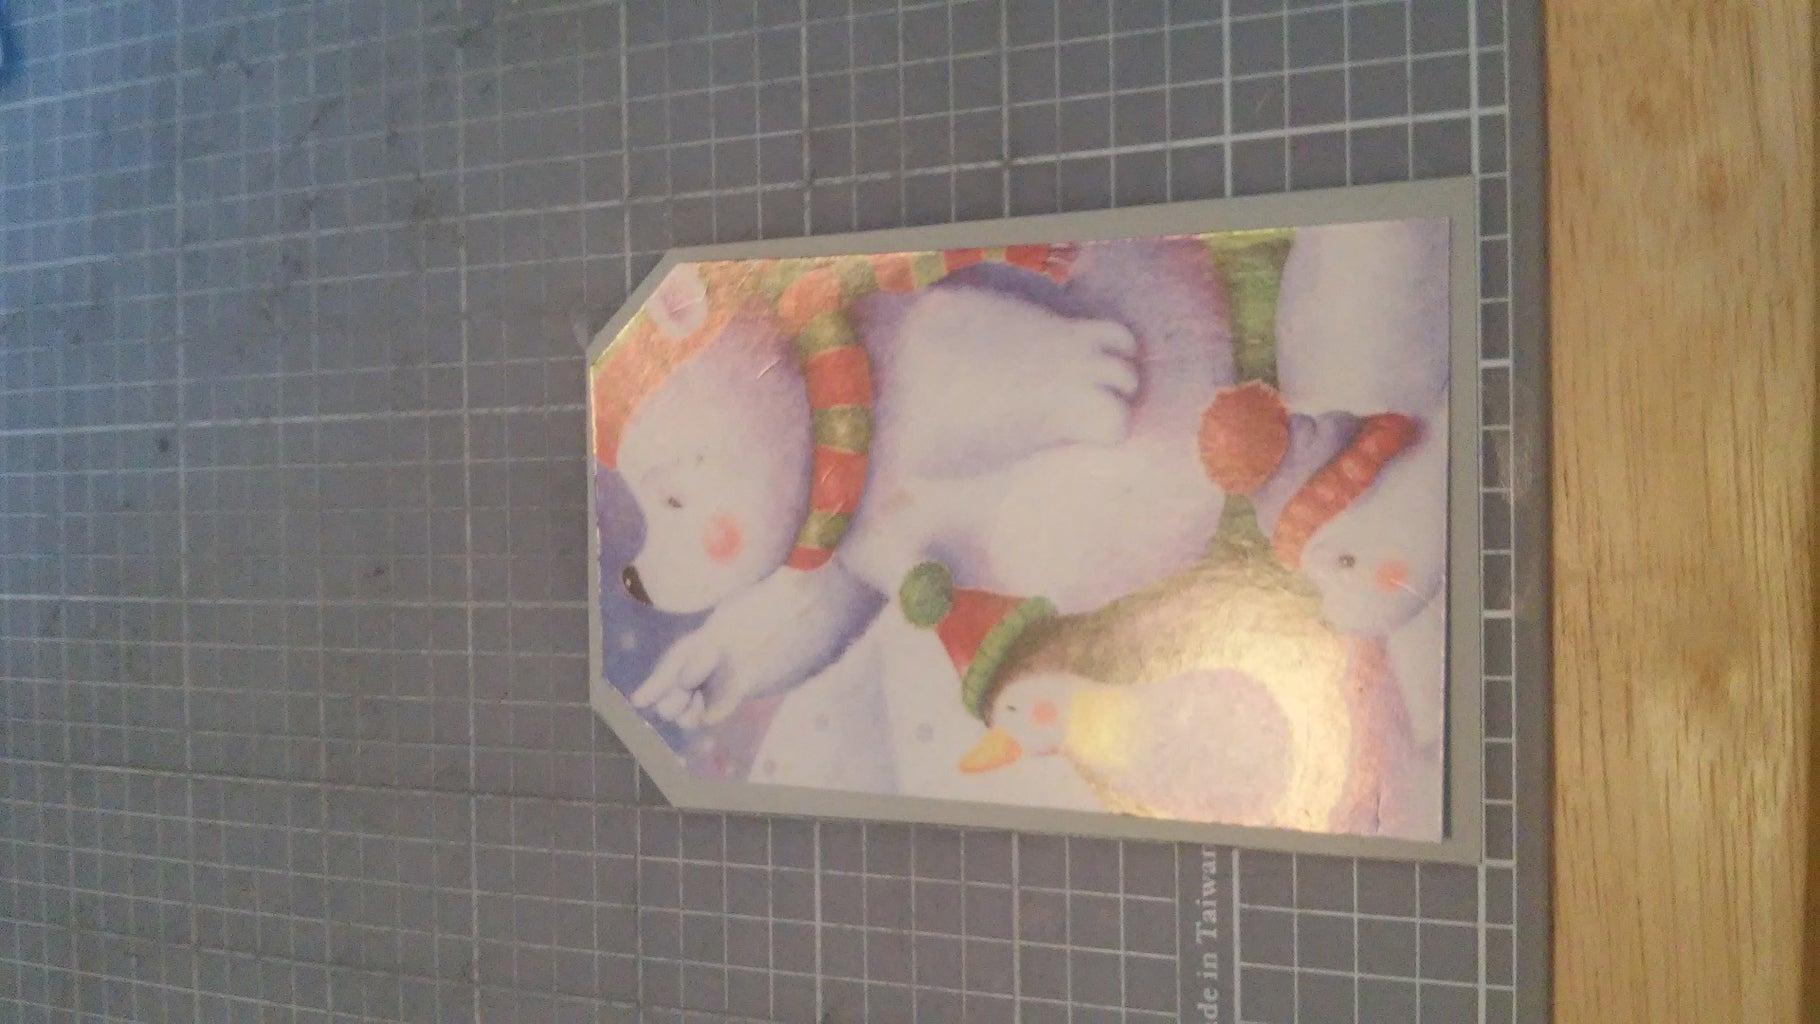 Glue Card to Backing